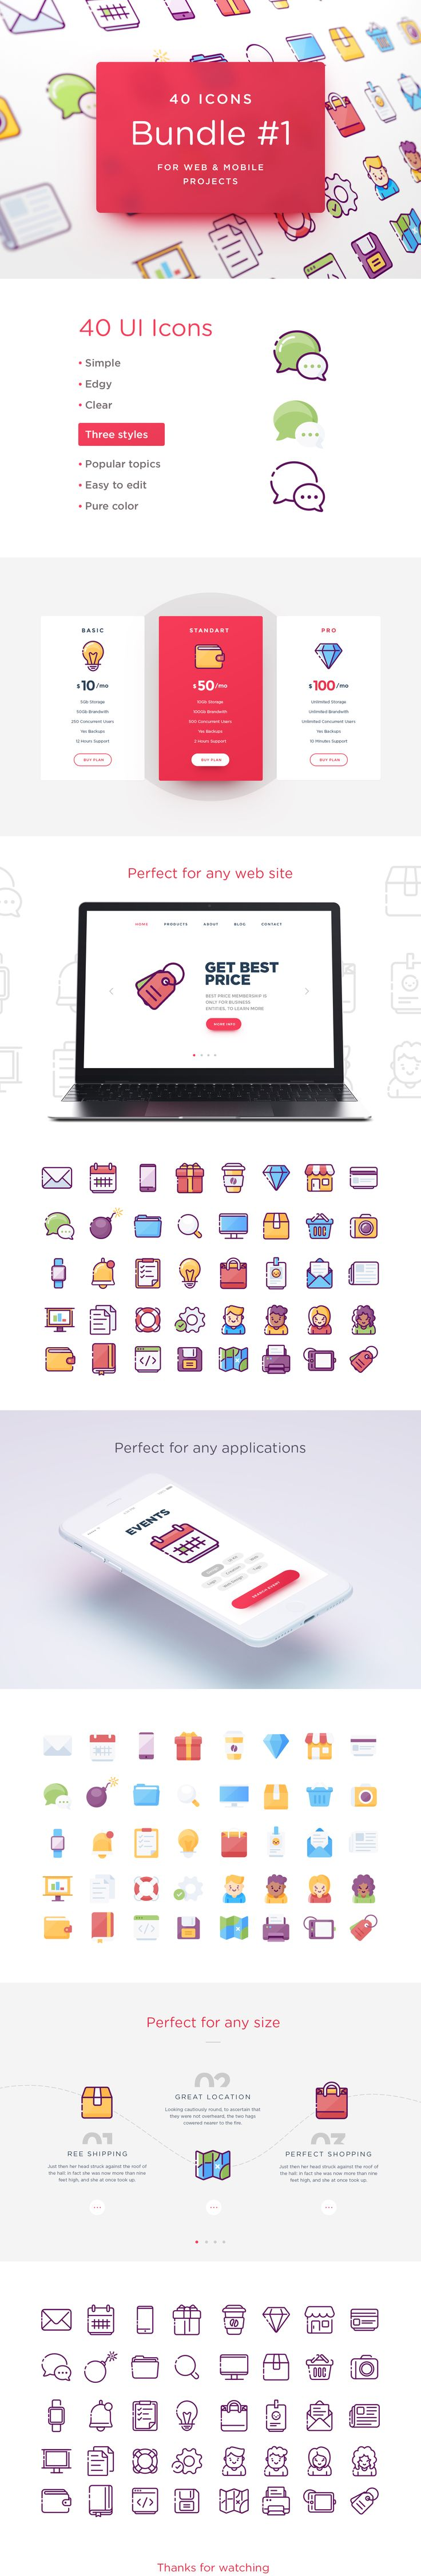 UI Icons. Bundle #1.